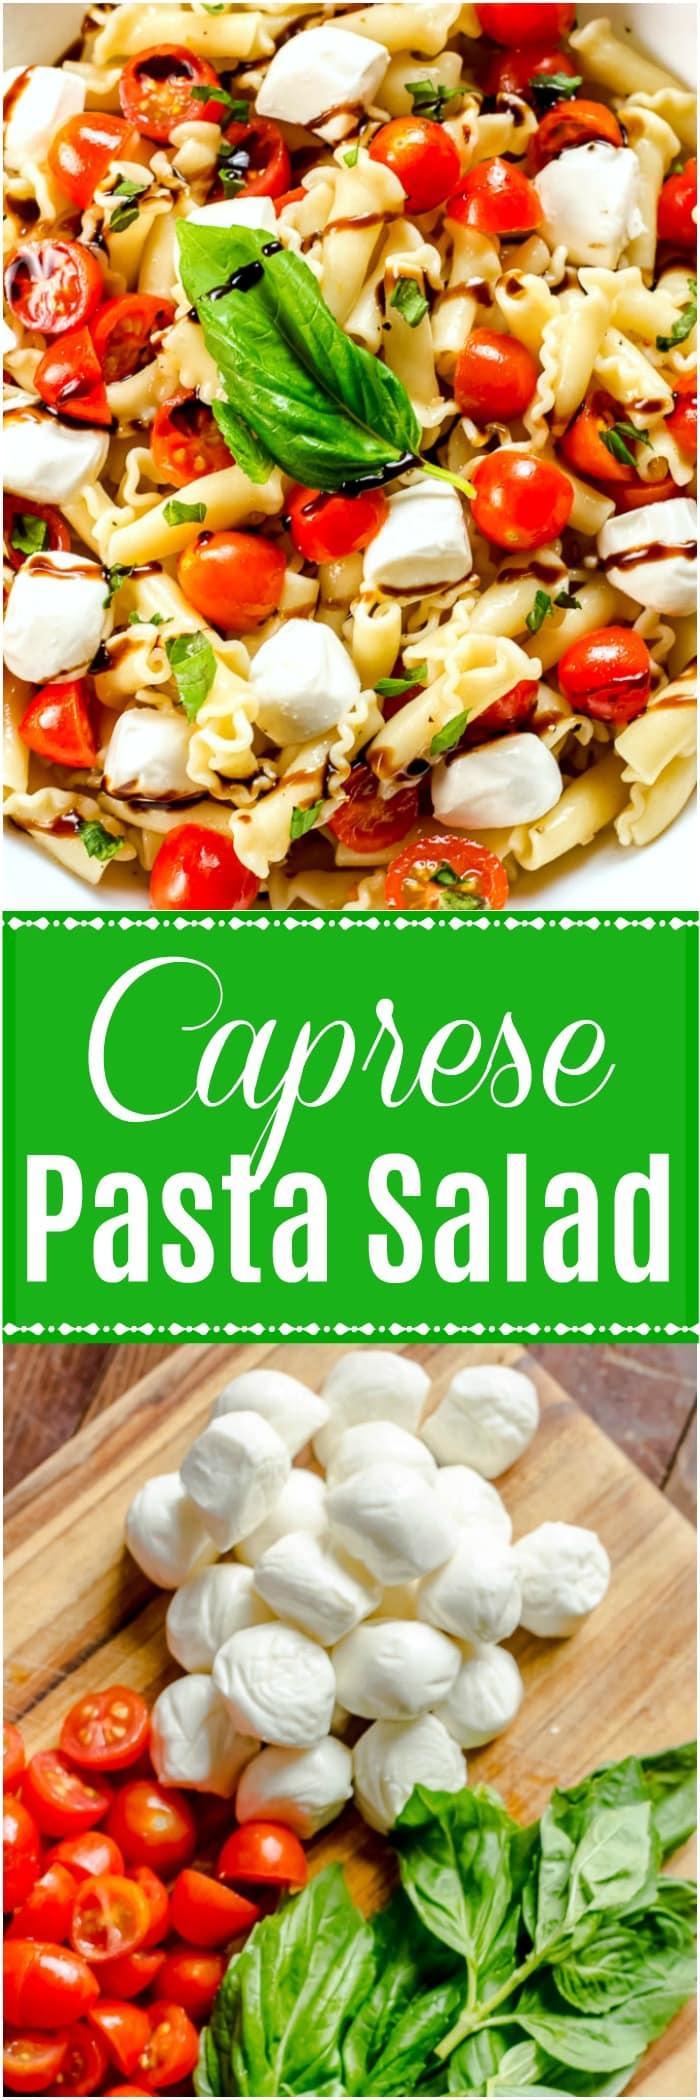 Caprese Pasta Salad - Caprese Salad